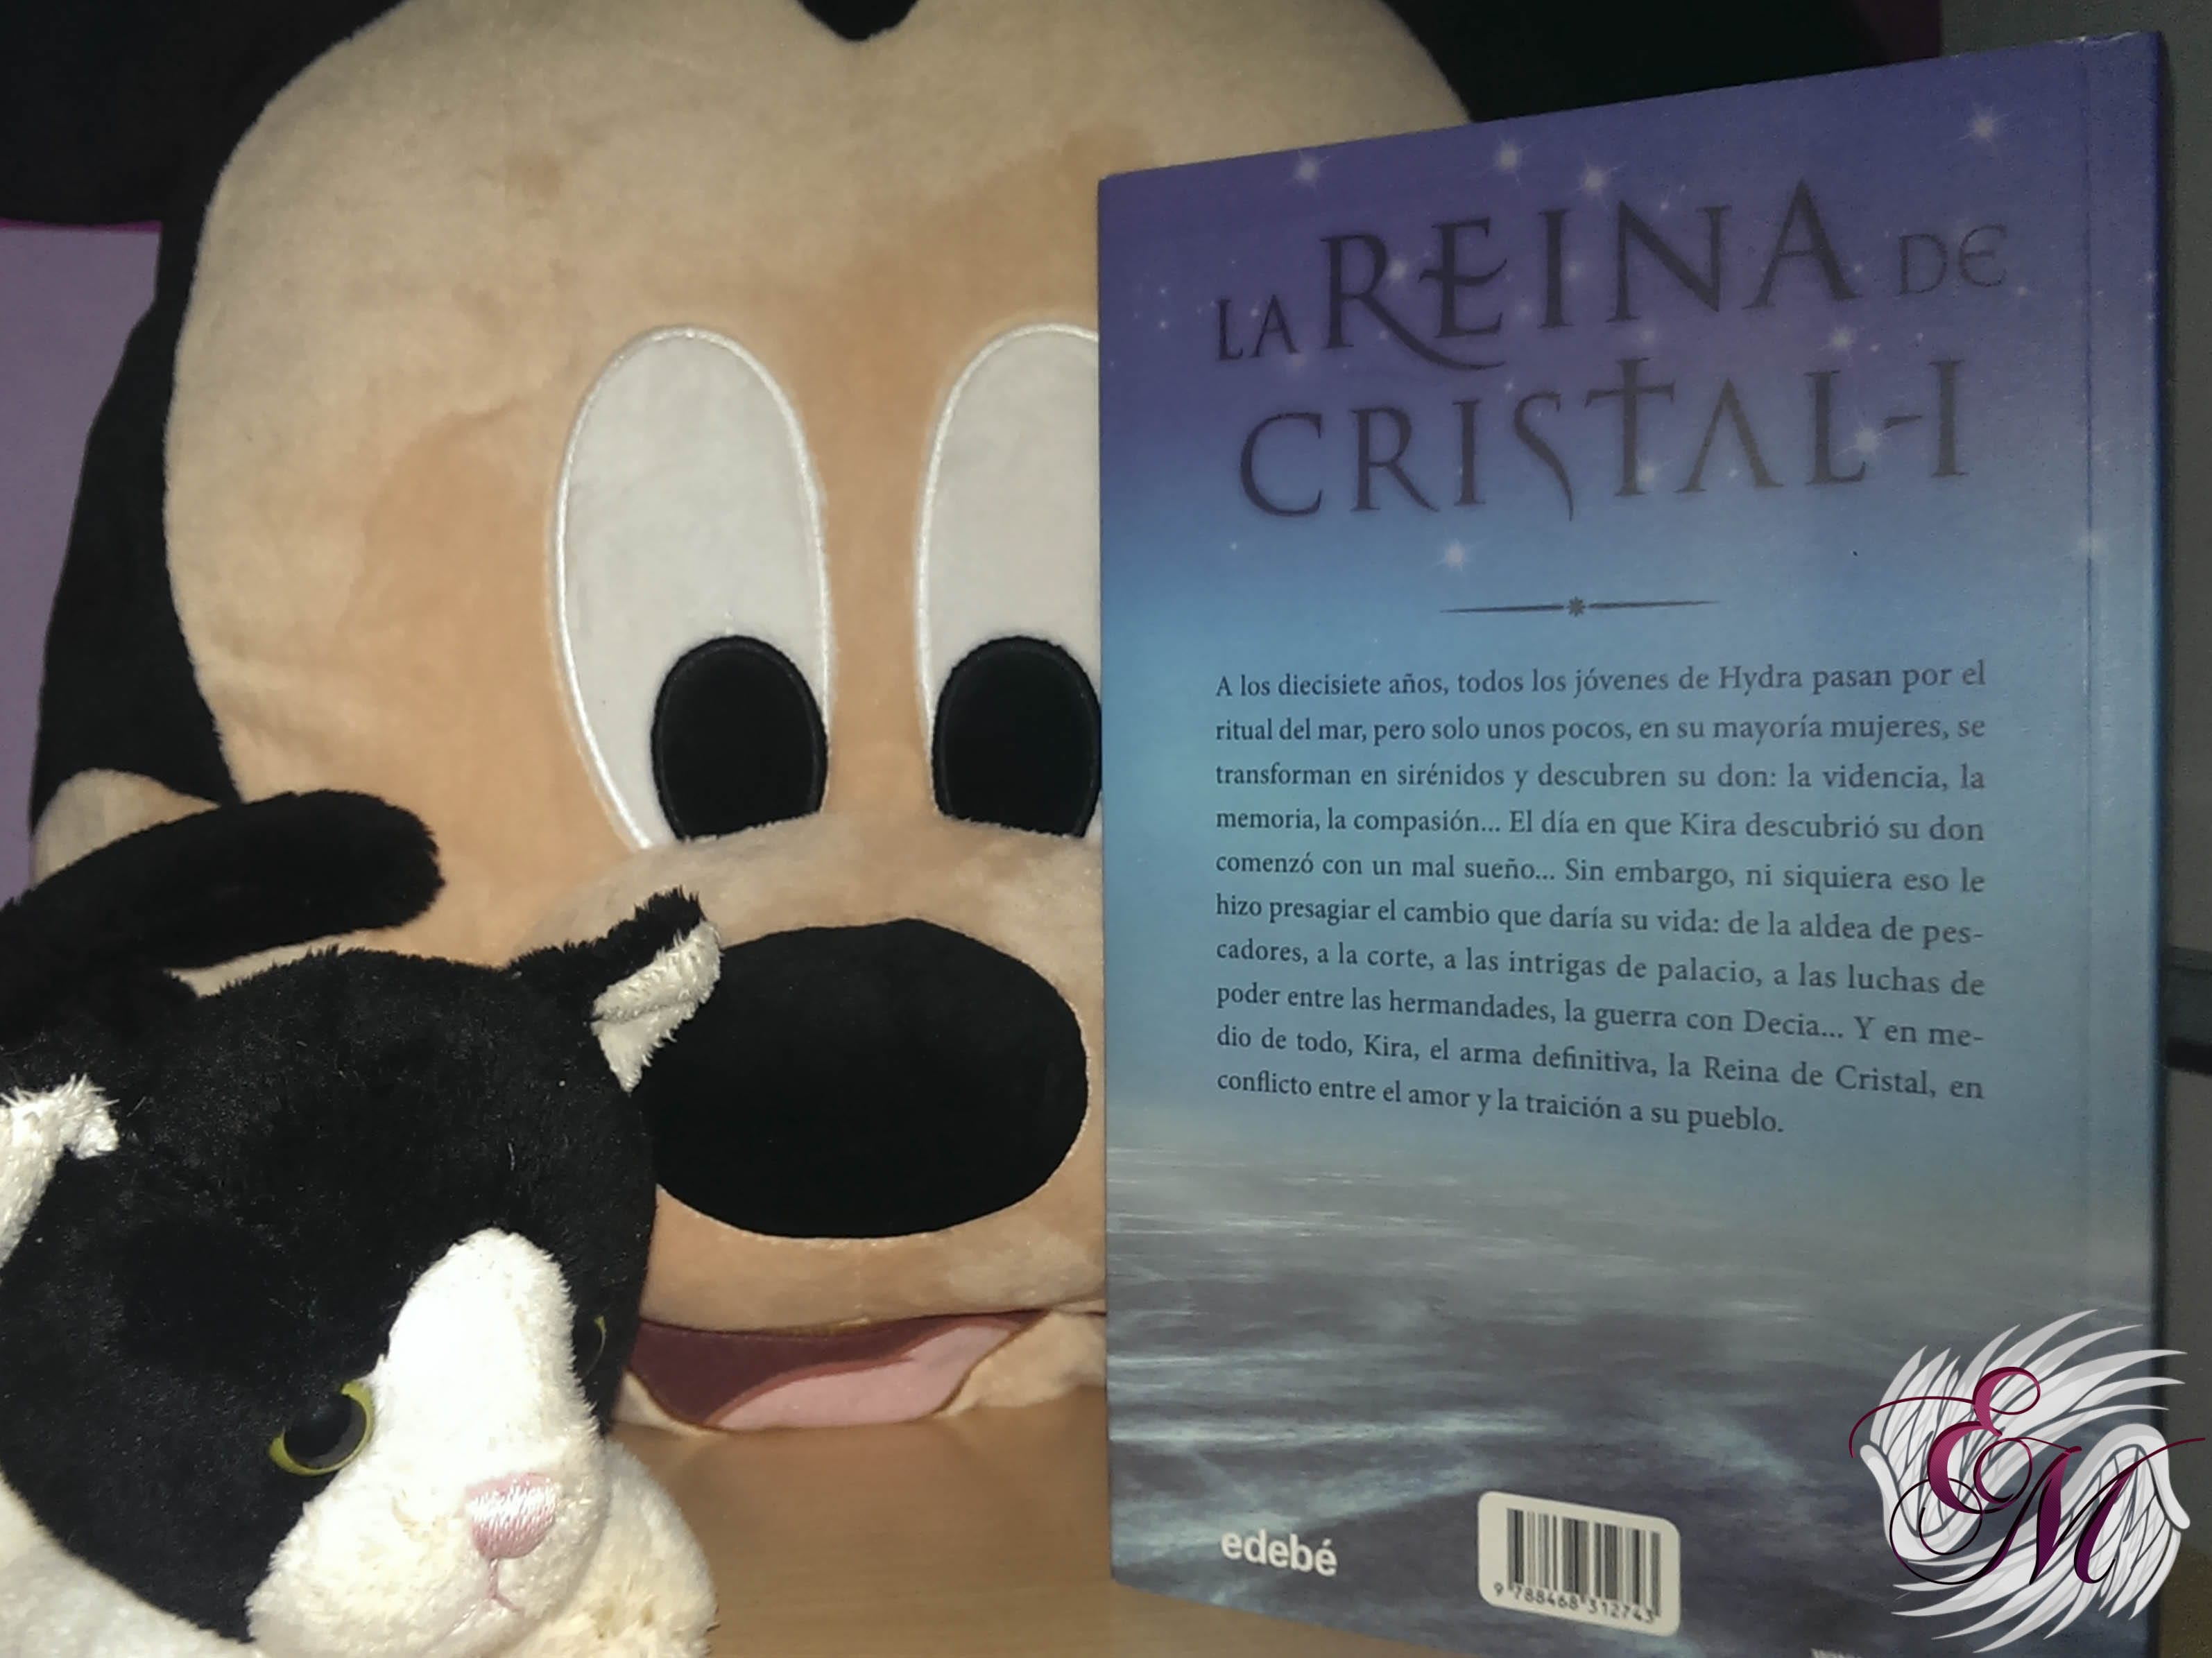 La reina de cristal, de Ana Alonso y Javier Pelegrín - Resela